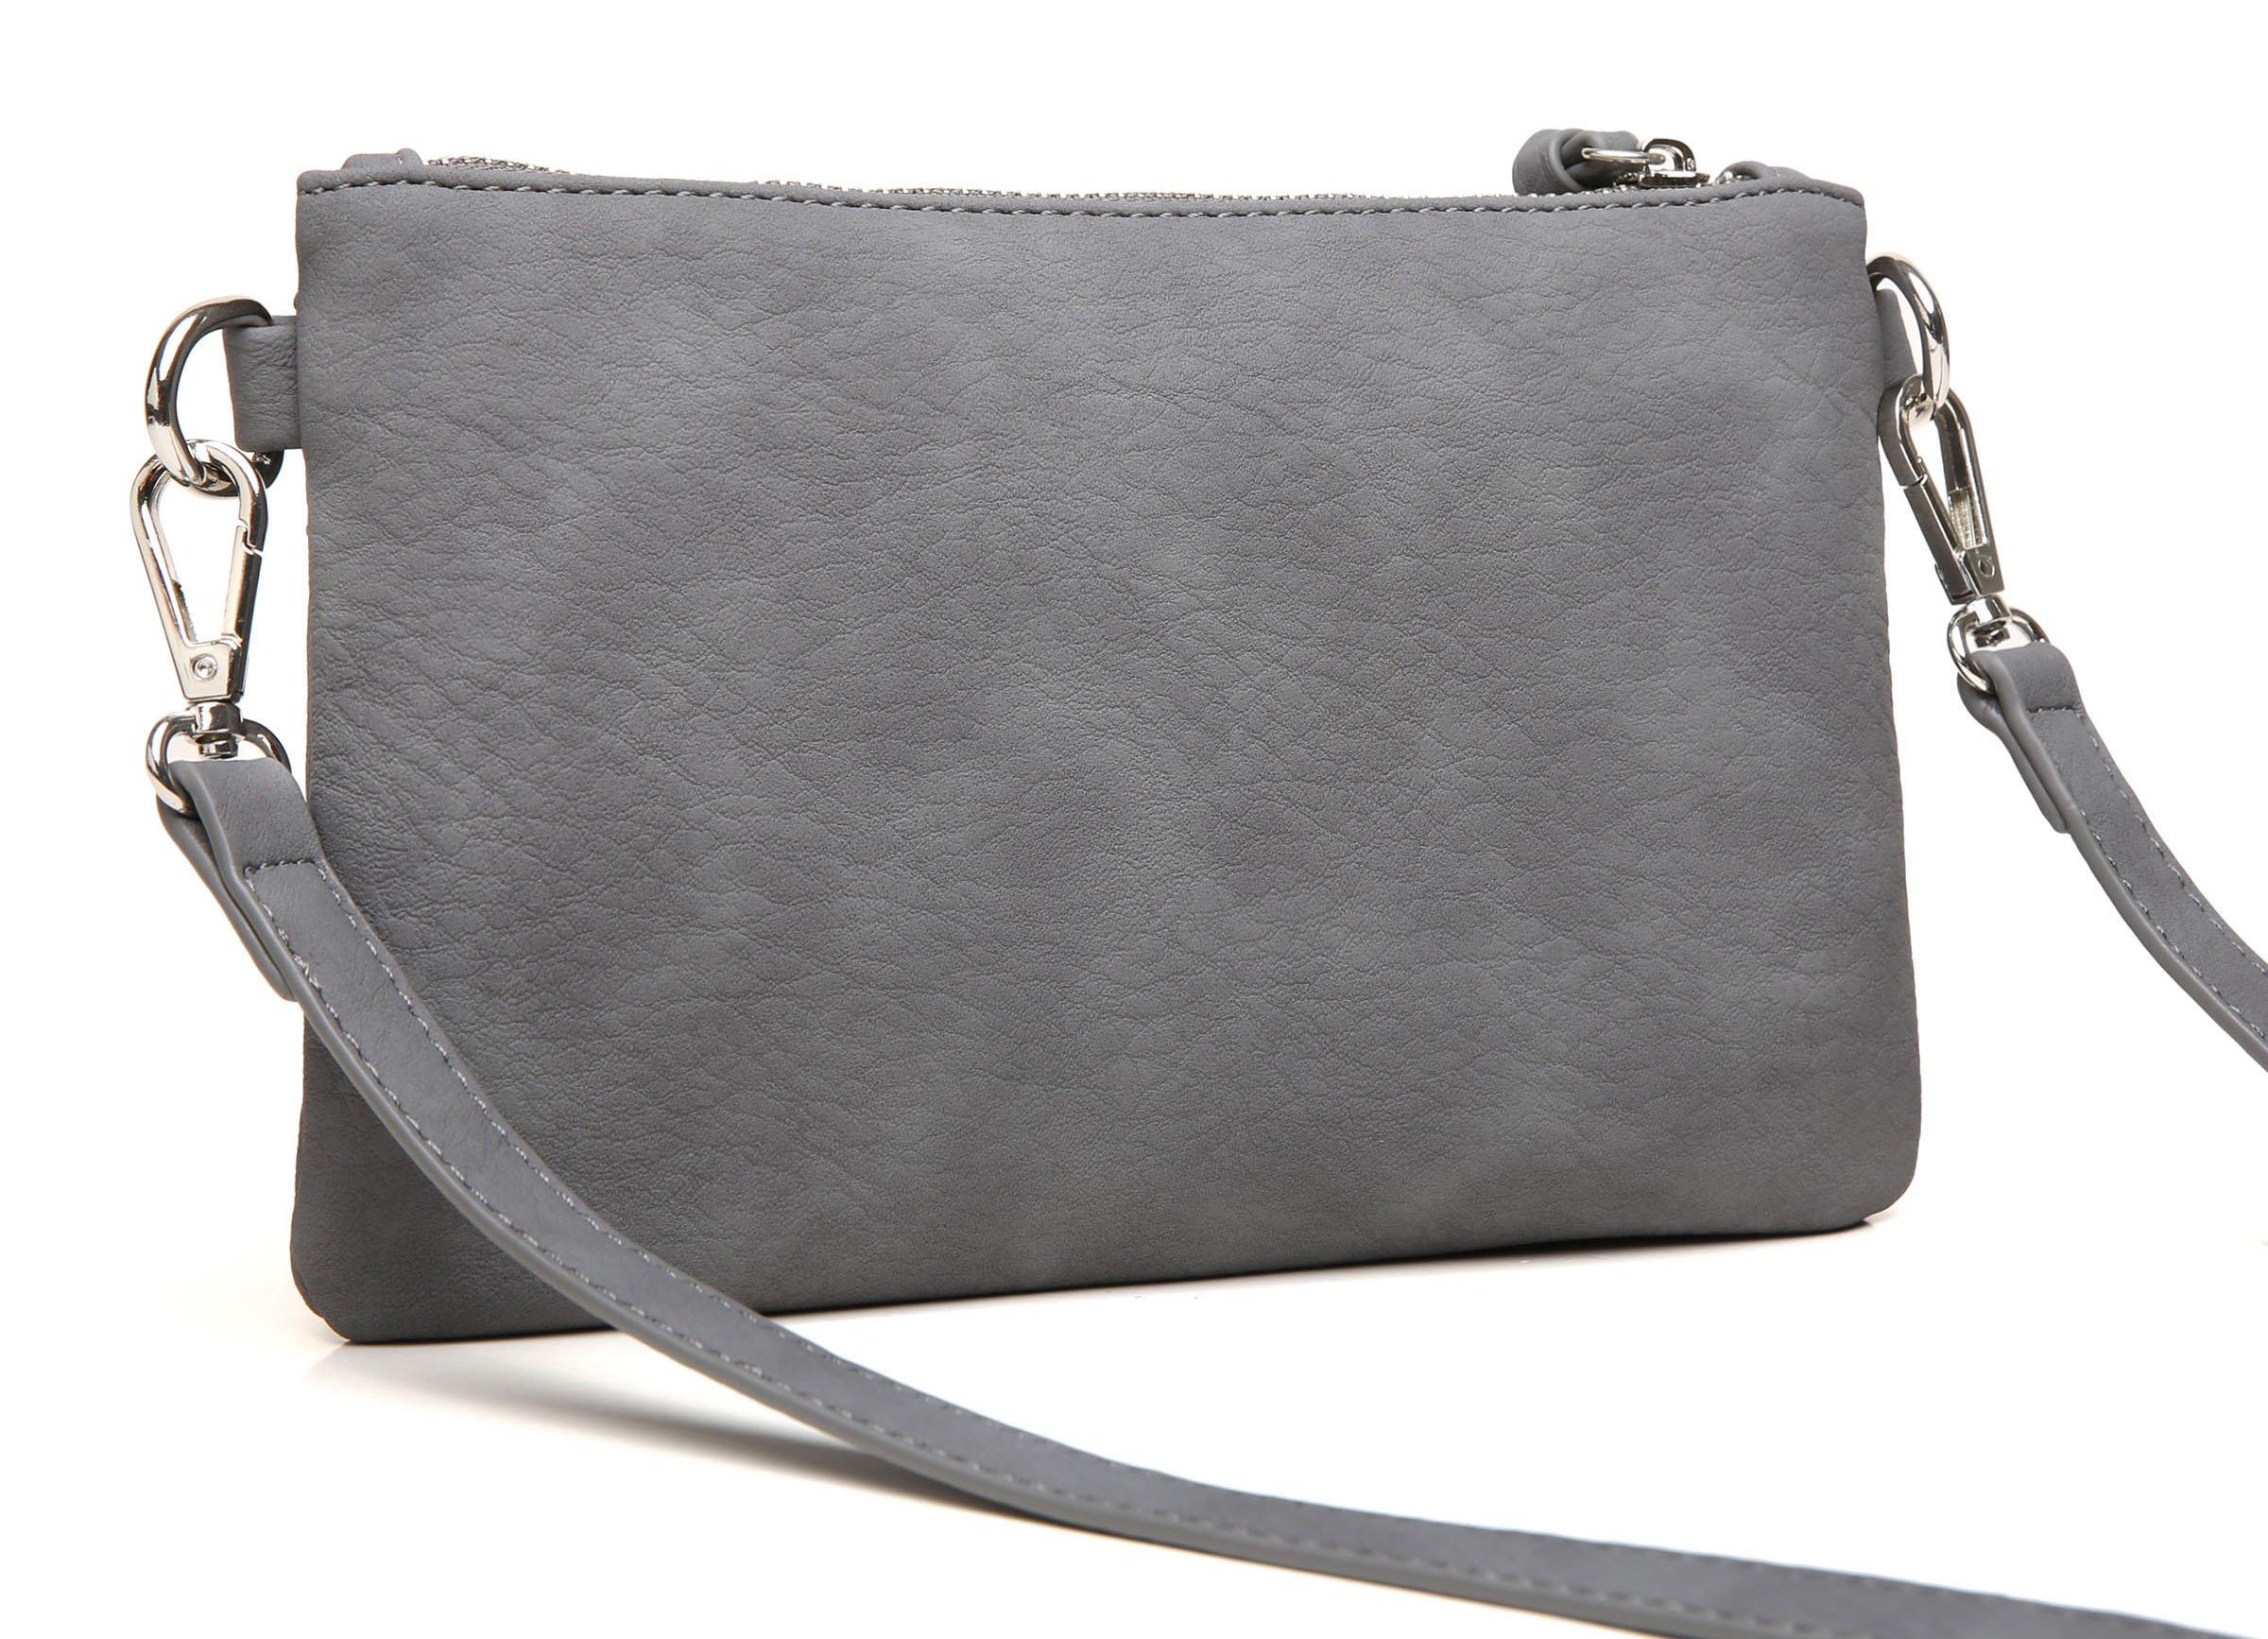 Aitbags Multi-Zipper Pocket Crossbody Handbag Lightweight Purse Functional Clutch with Wristlet by Aitbags (Image #3)